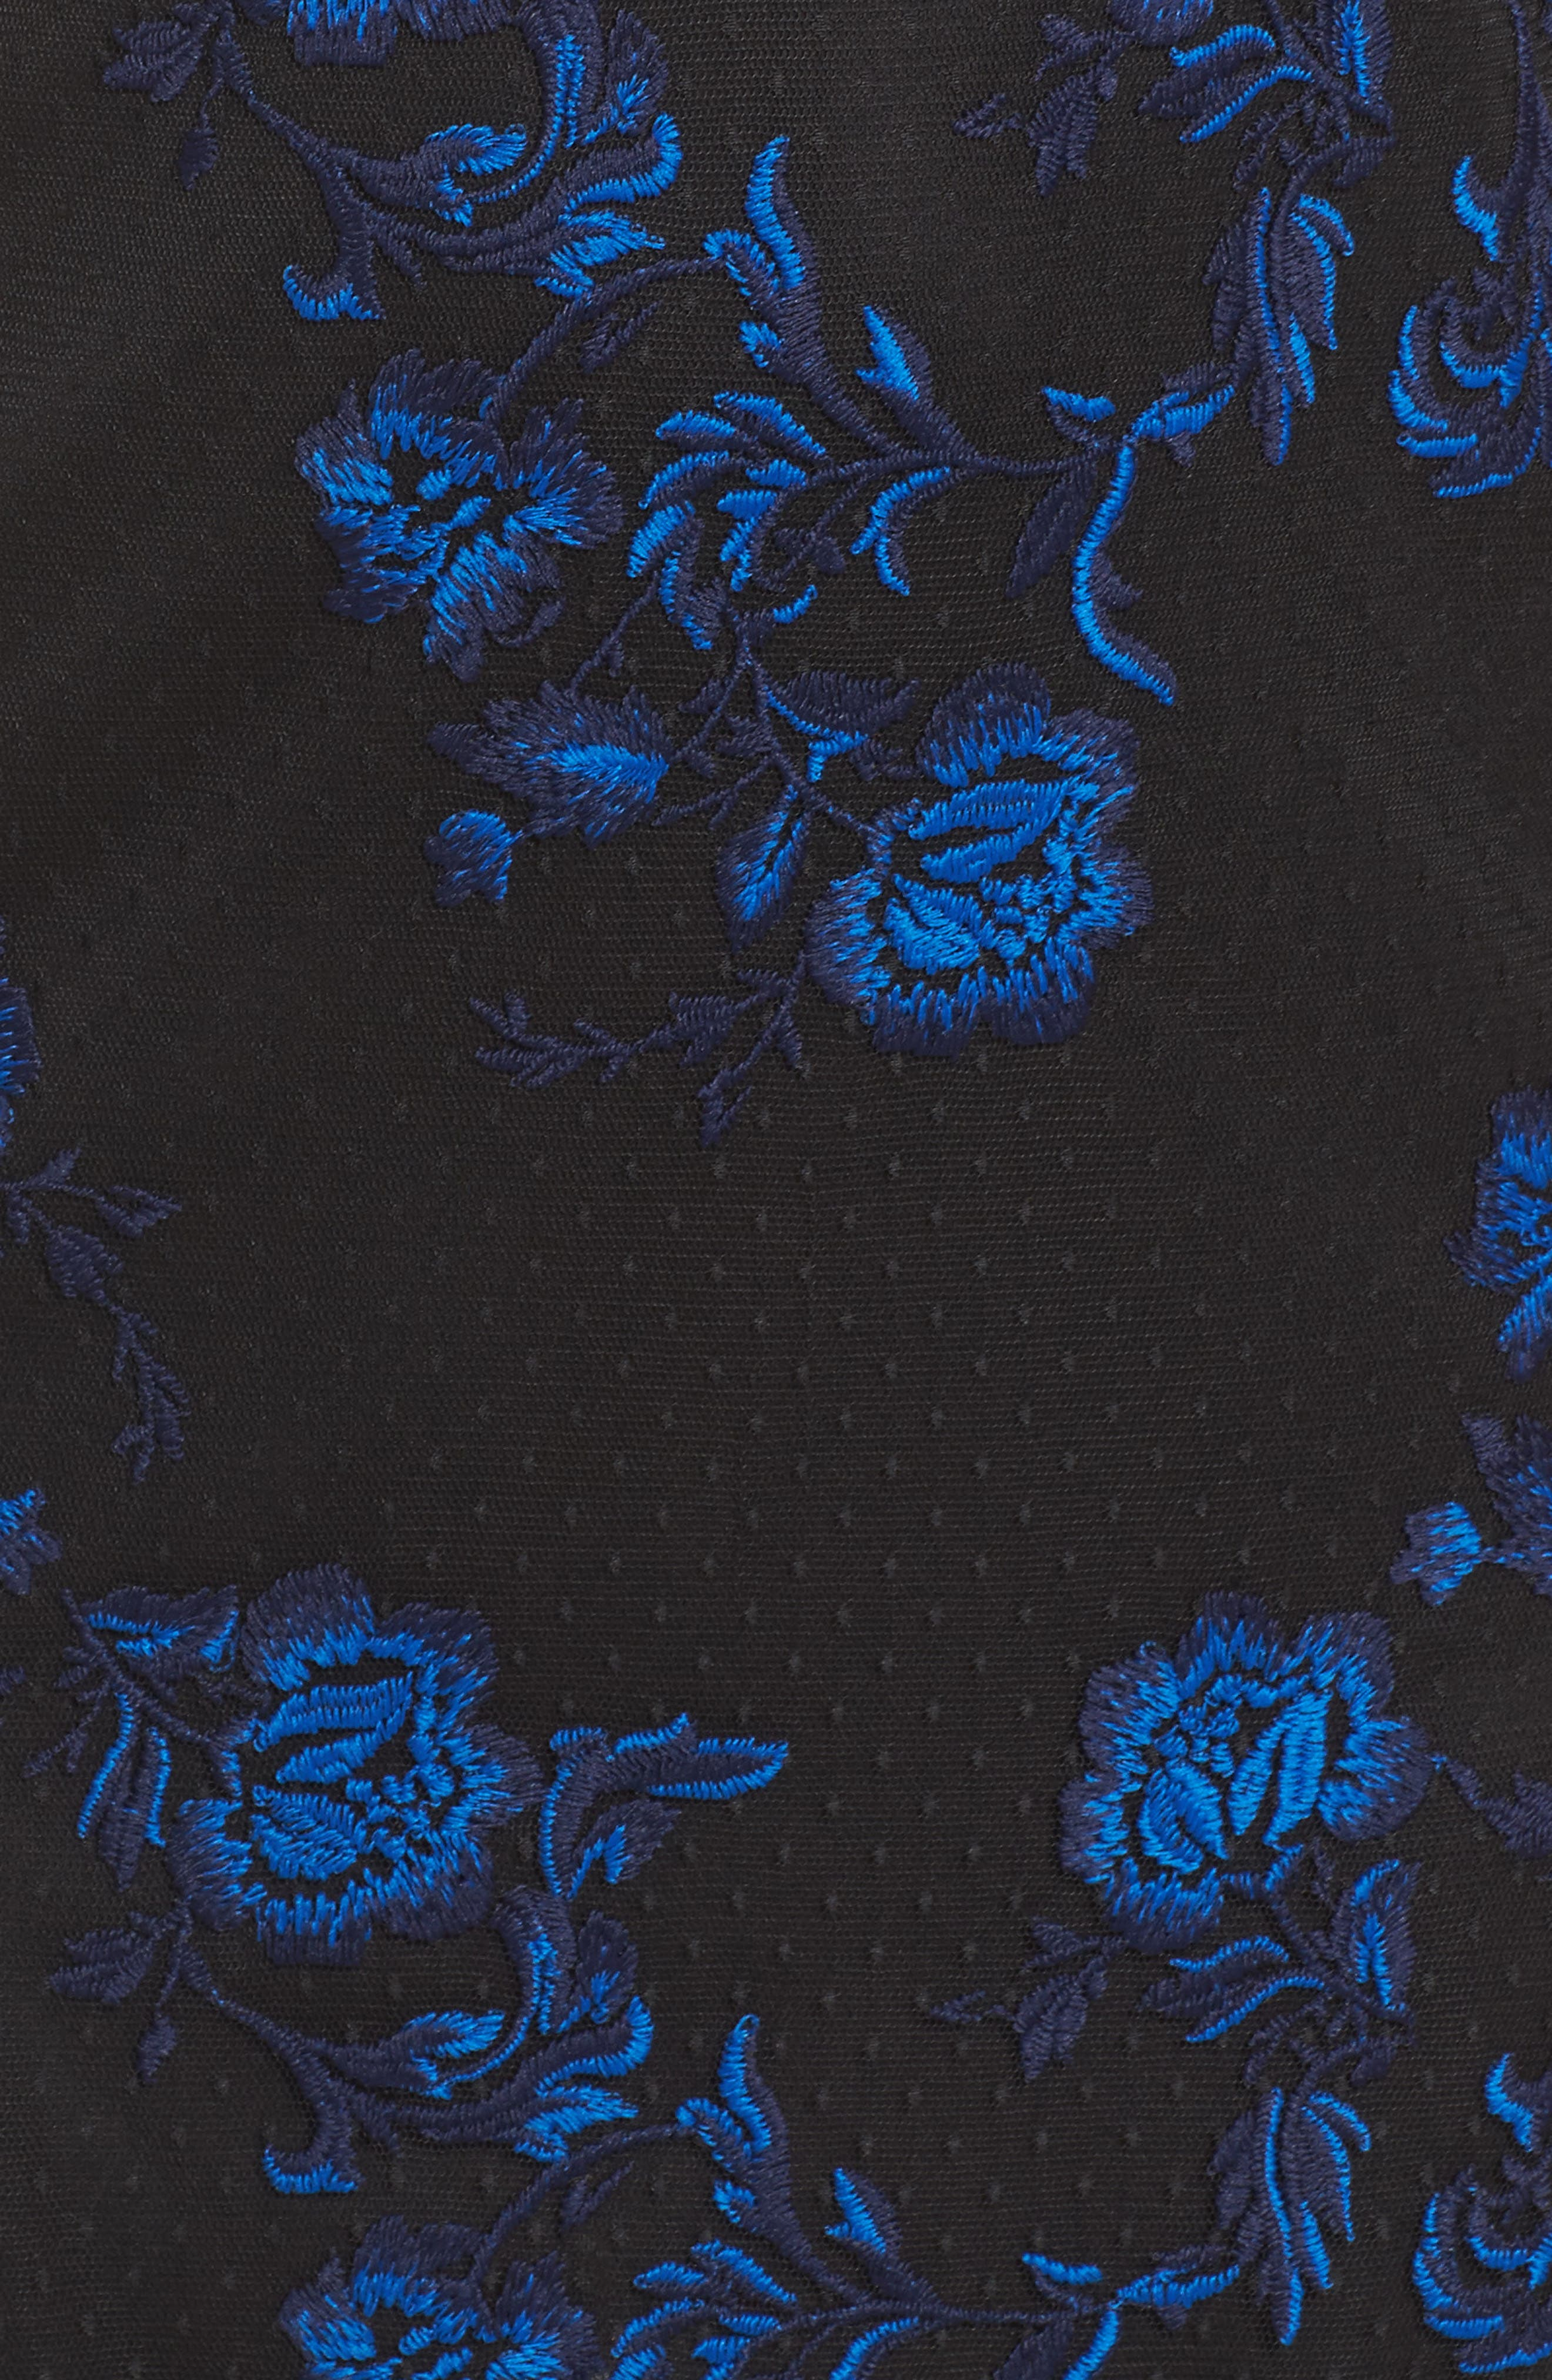 Embroidered Mesh Sheath Dress,                             Alternate thumbnail 5, color,                             Blue/ Black